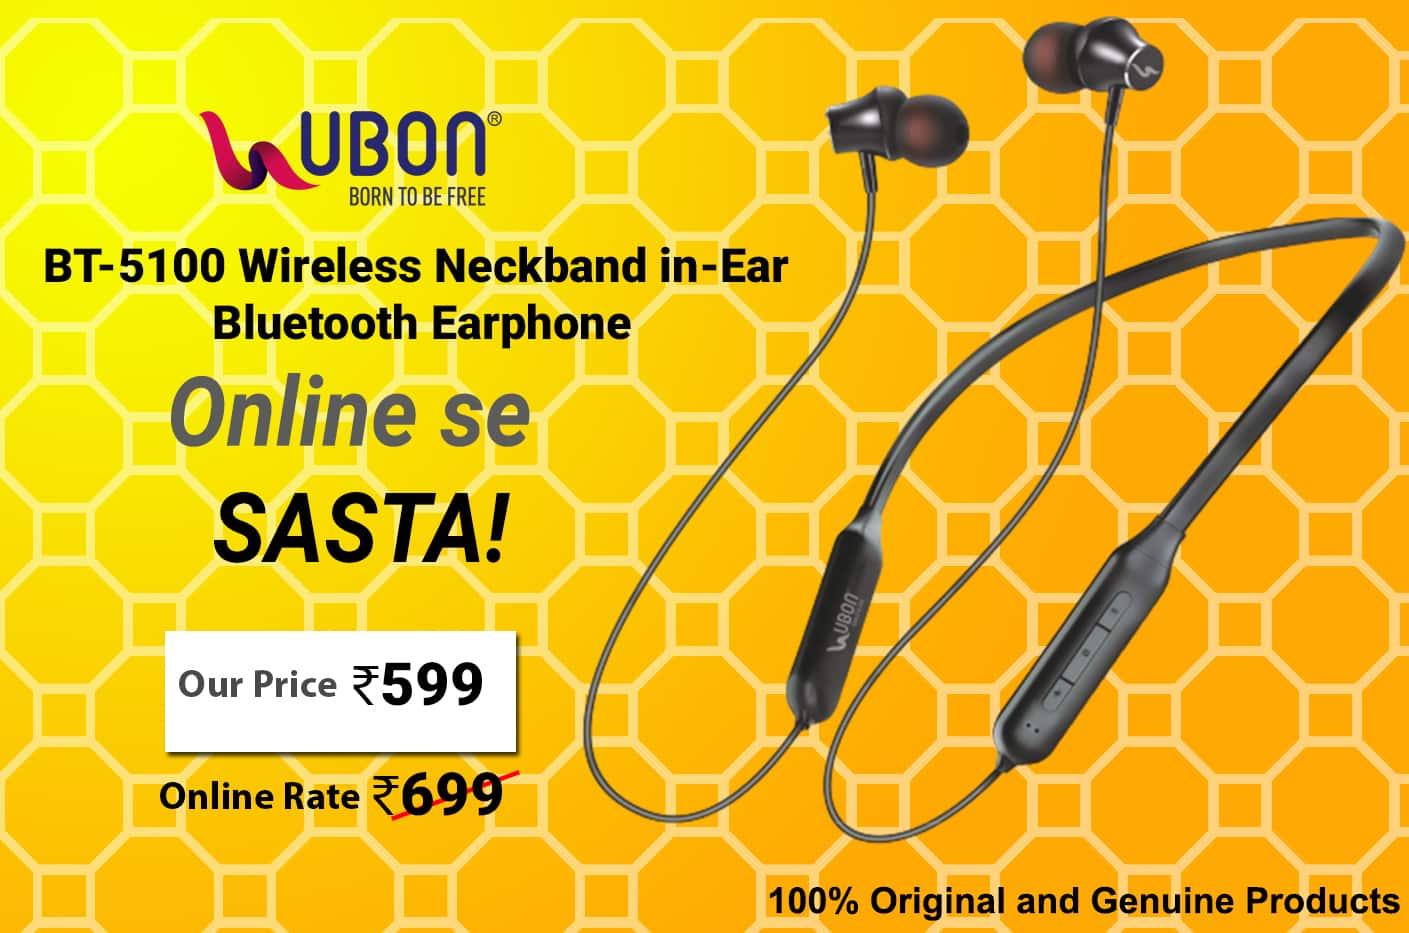 Ubon BT-5100 Bluetooth Earphones